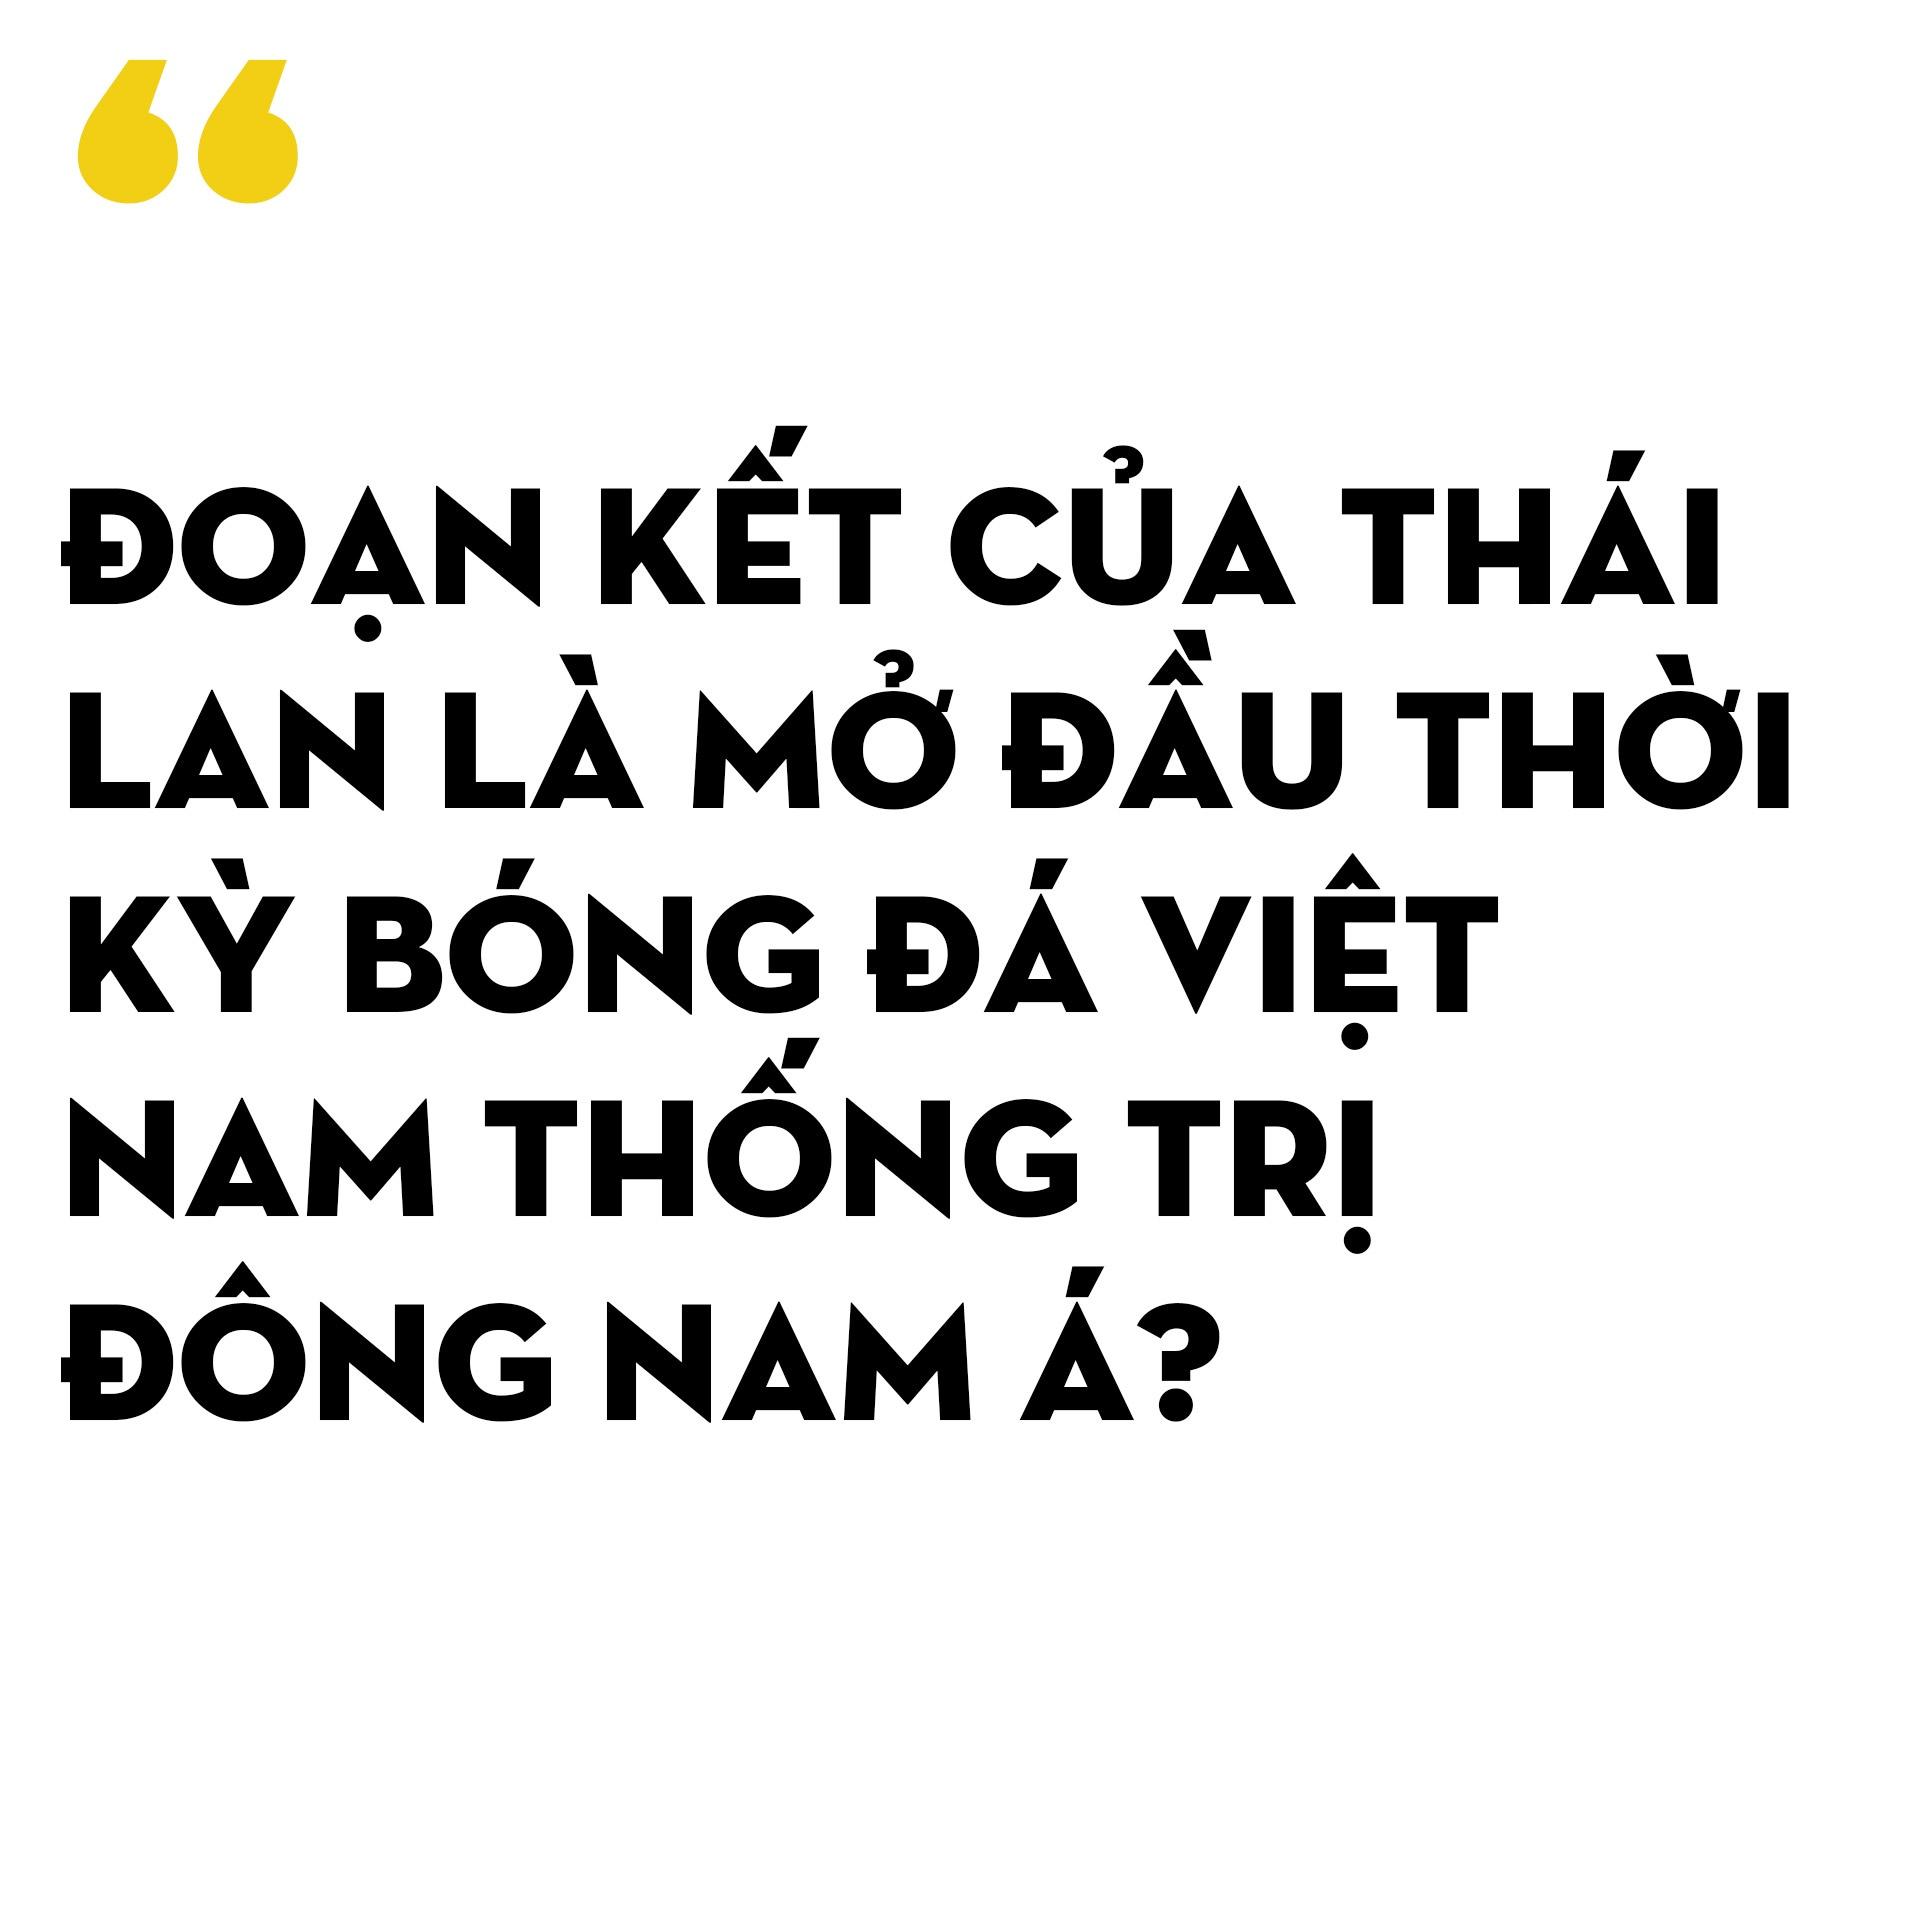 The he Quang Hai thong tri bong da Dong Nam A hinh anh 18